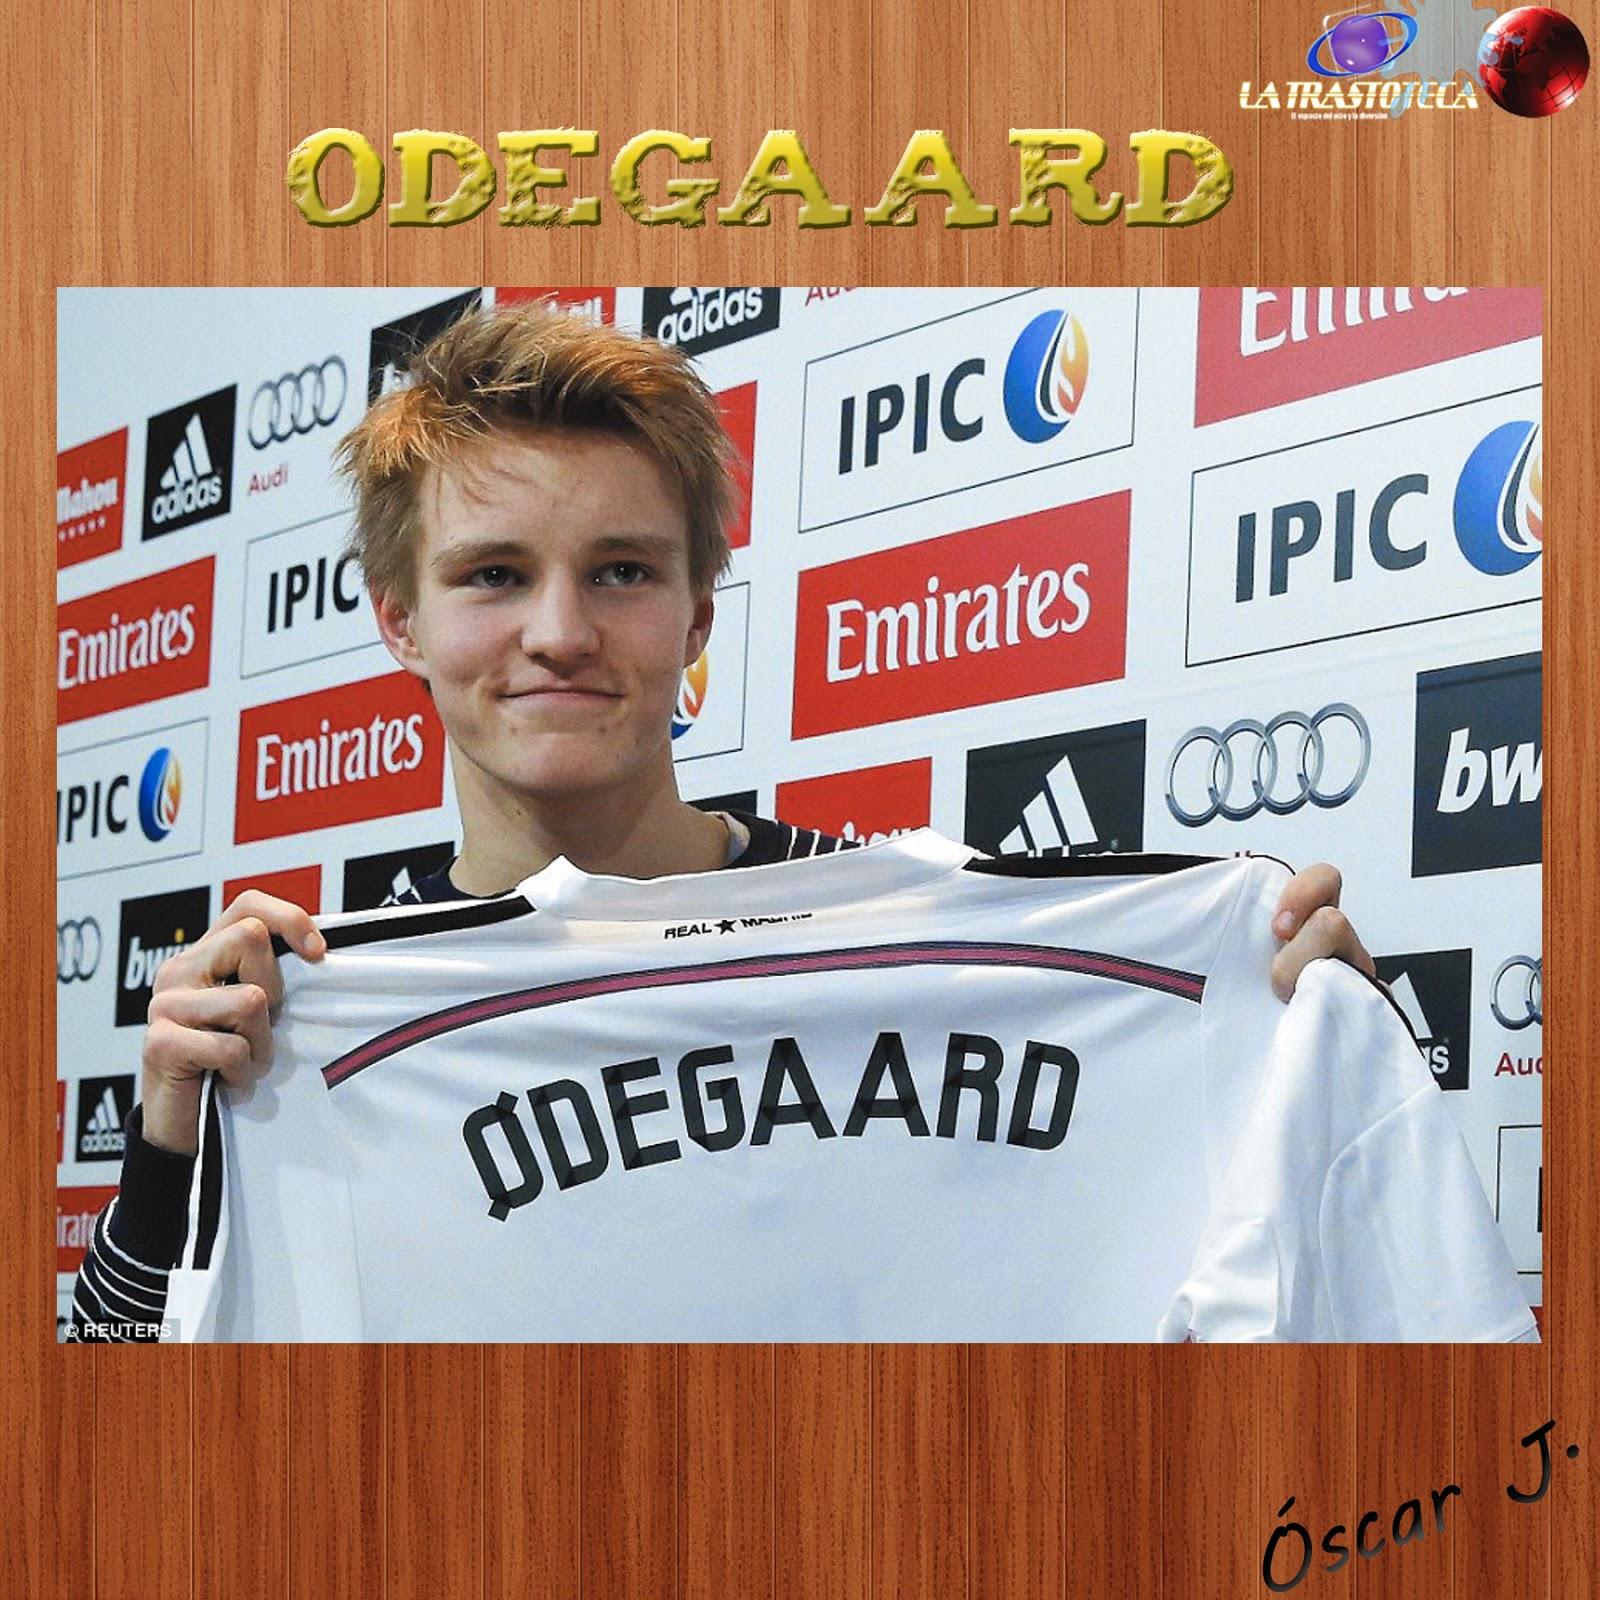 Odegaard nuevo fichaje del Real Madrid.